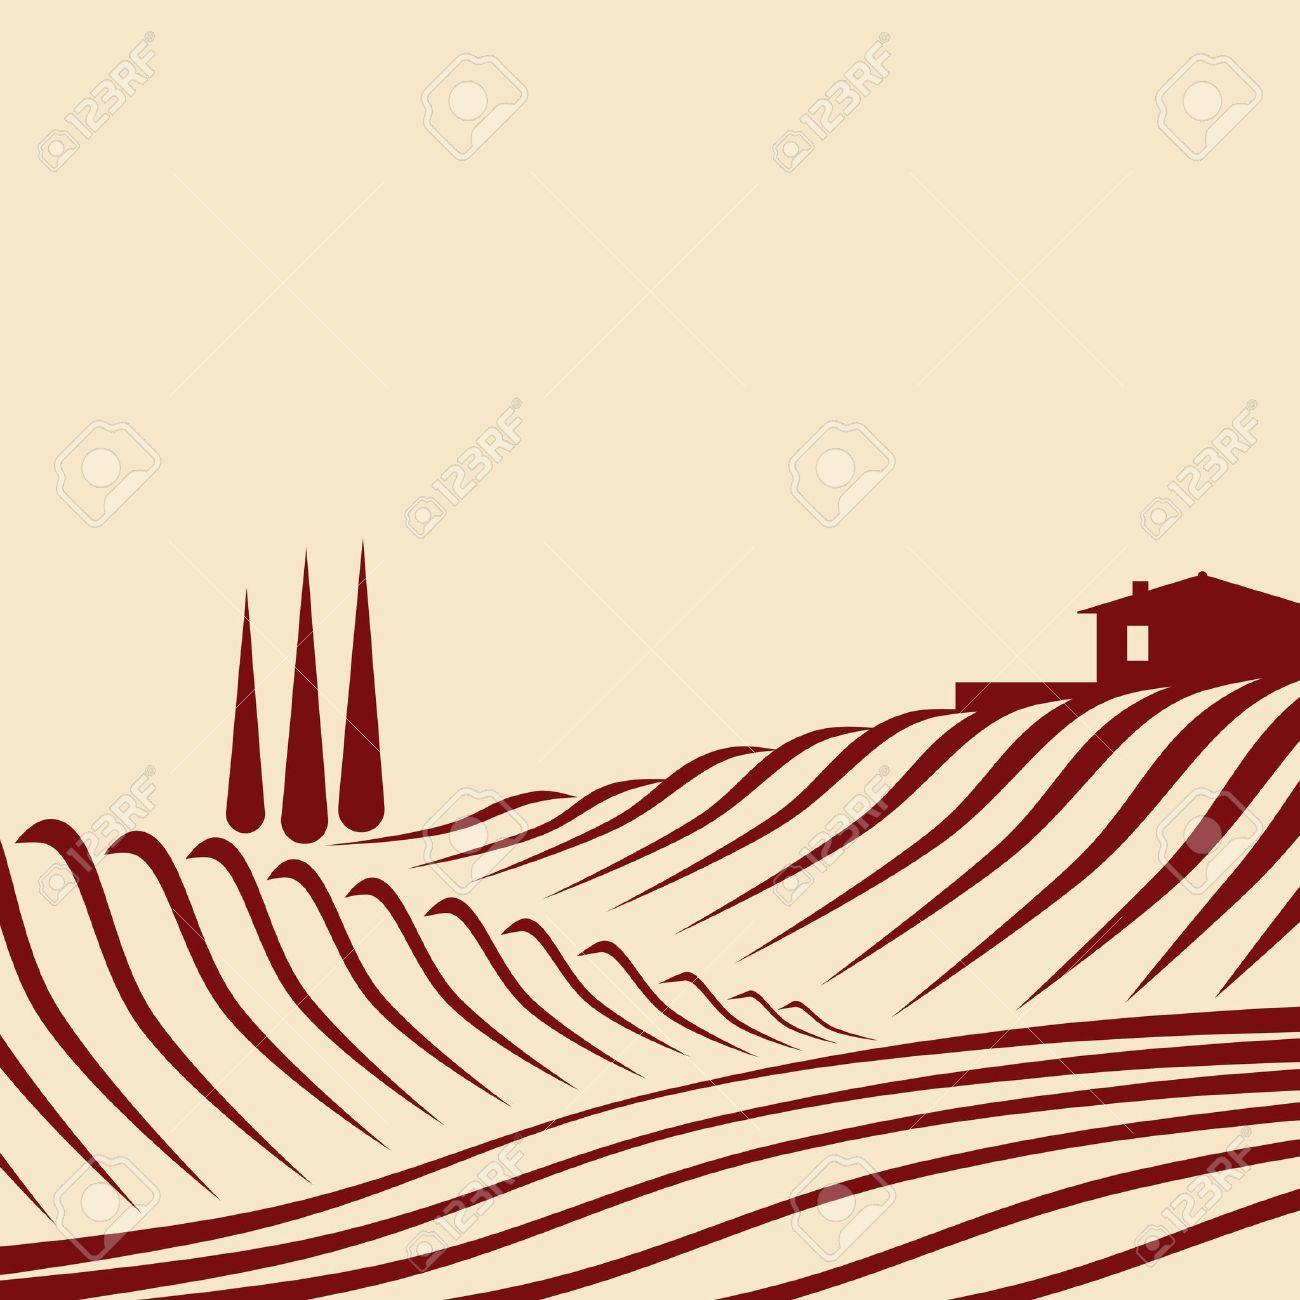 agricultural landscape Stock Vector - 10823451